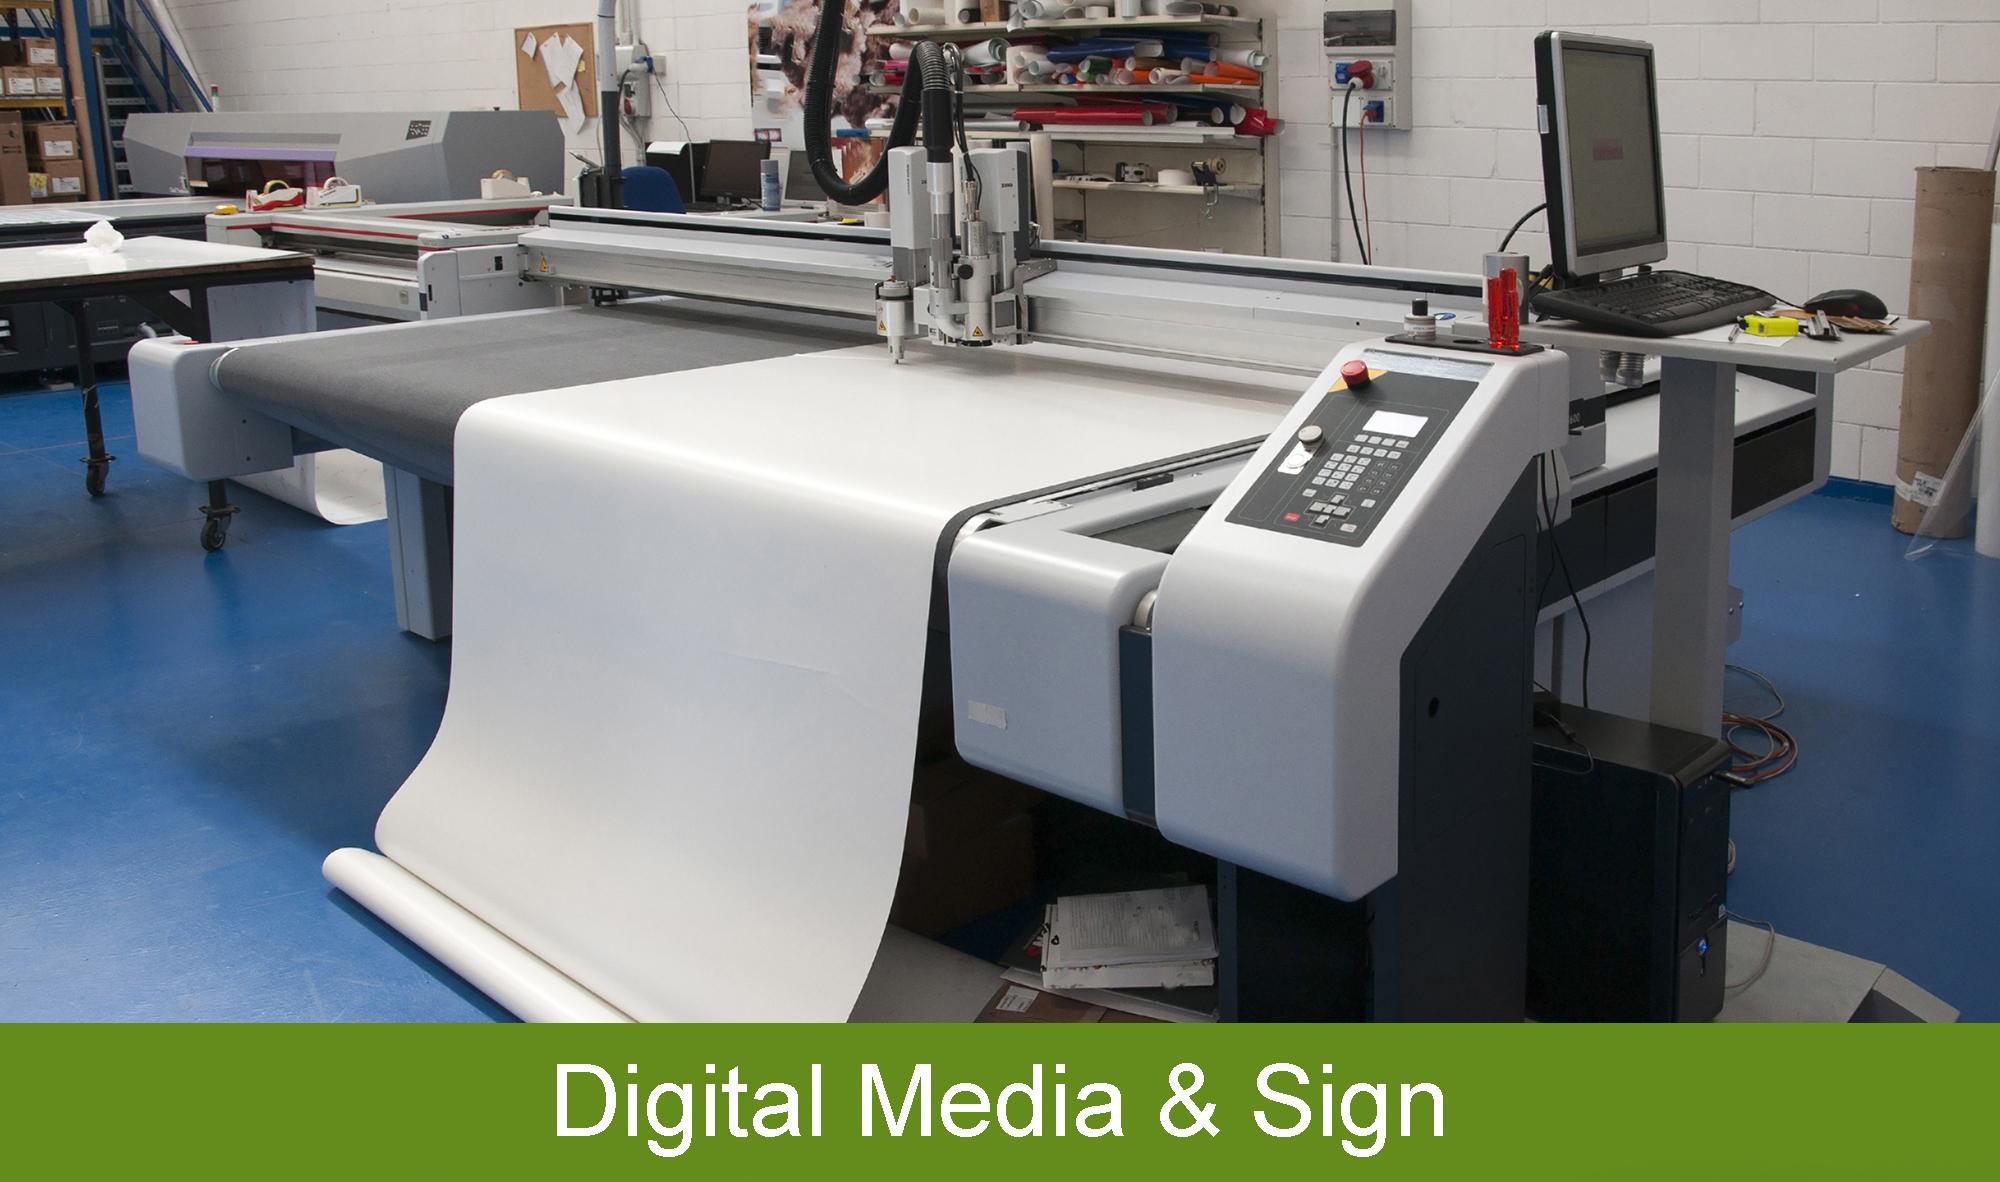 digital media & sign products